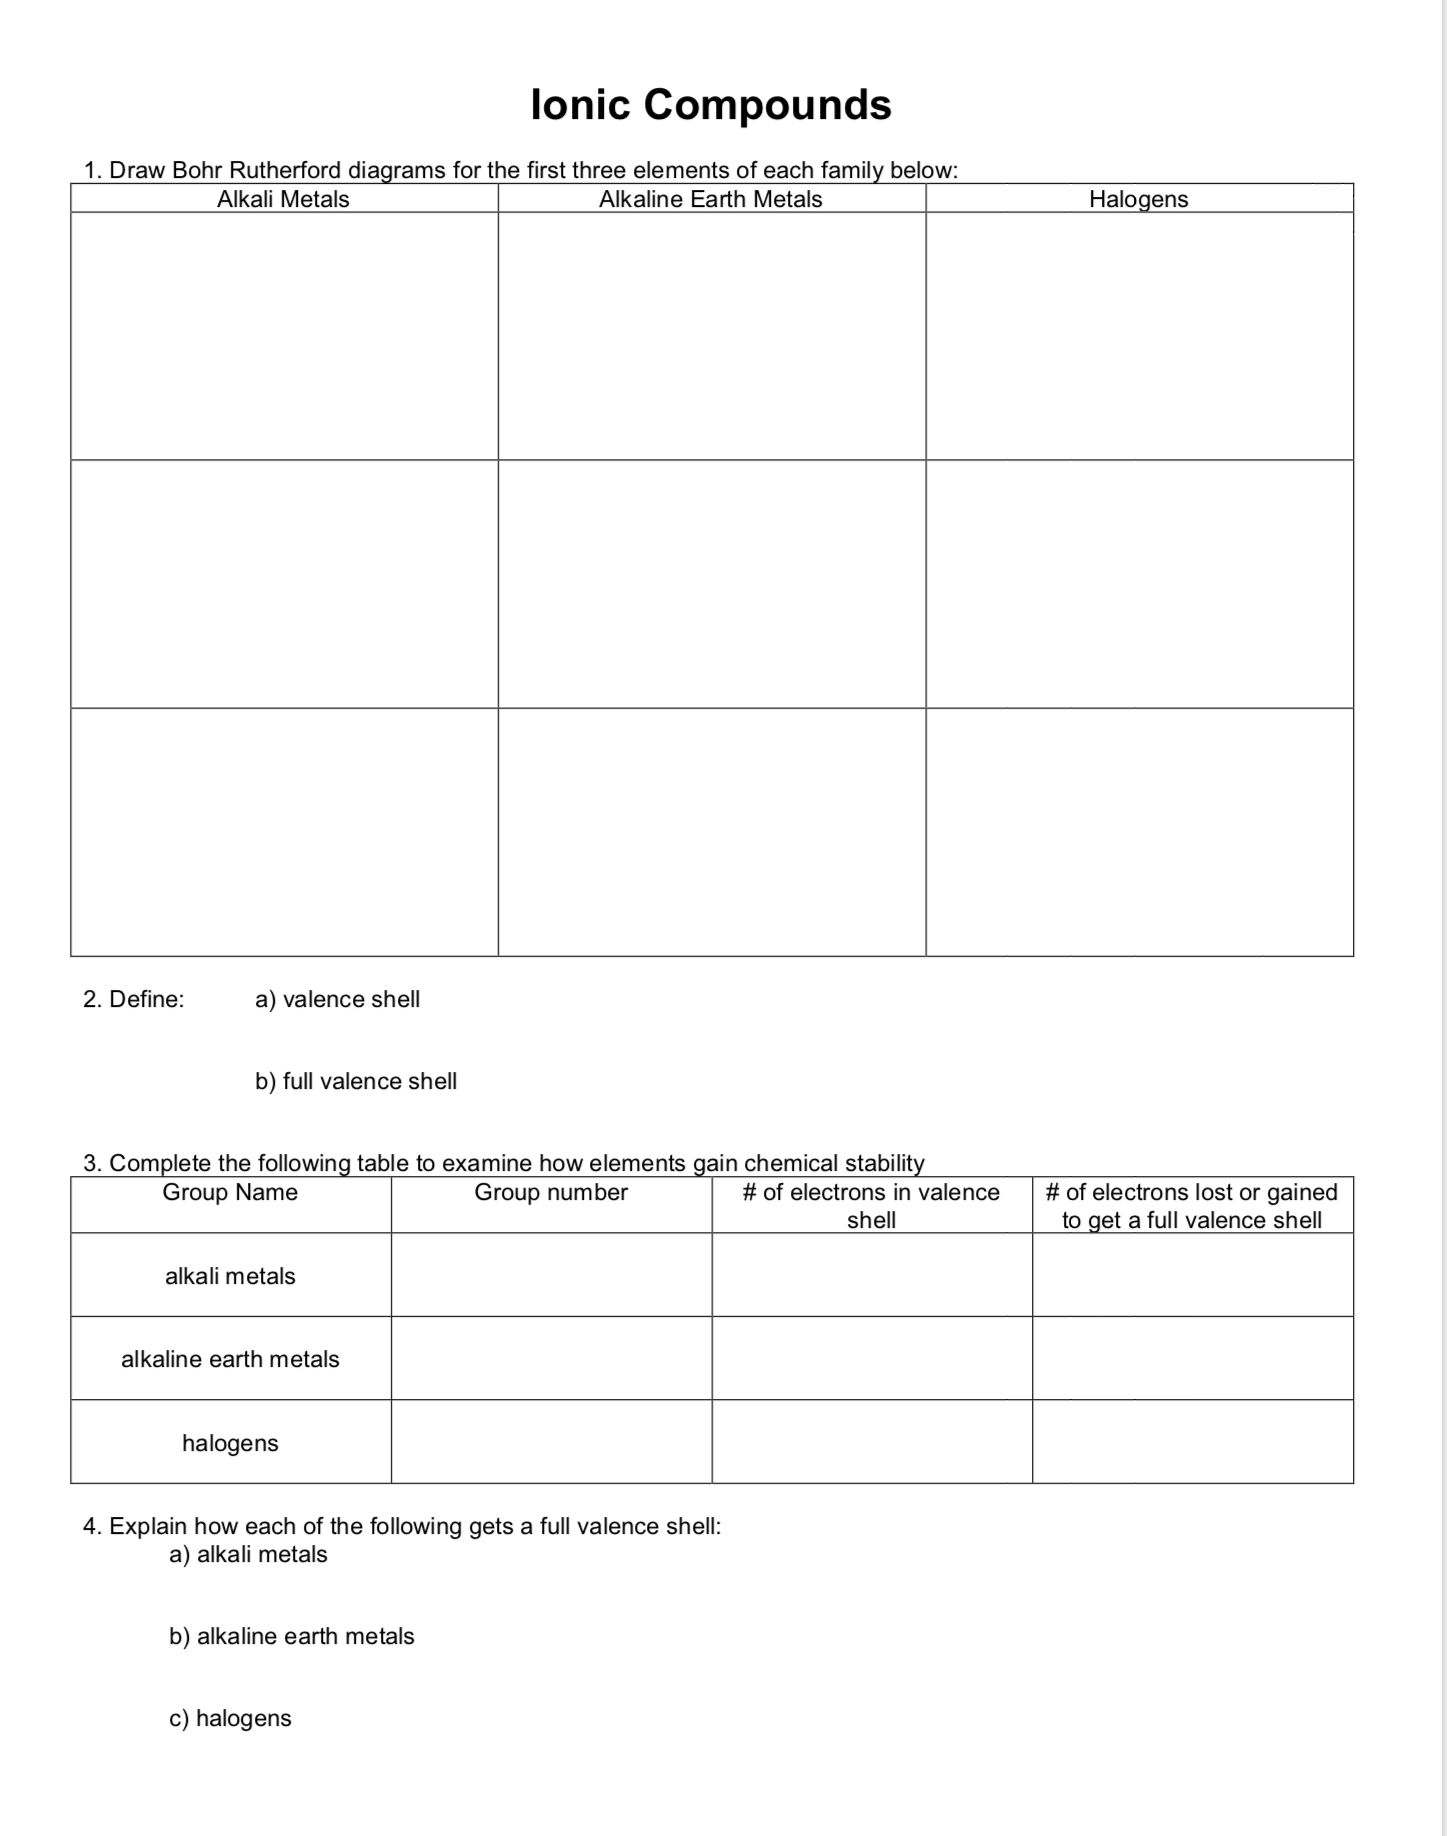 Ionic Compounds Worksheet Monday April 15 2019 Ionic Compound Compounds Chemistry